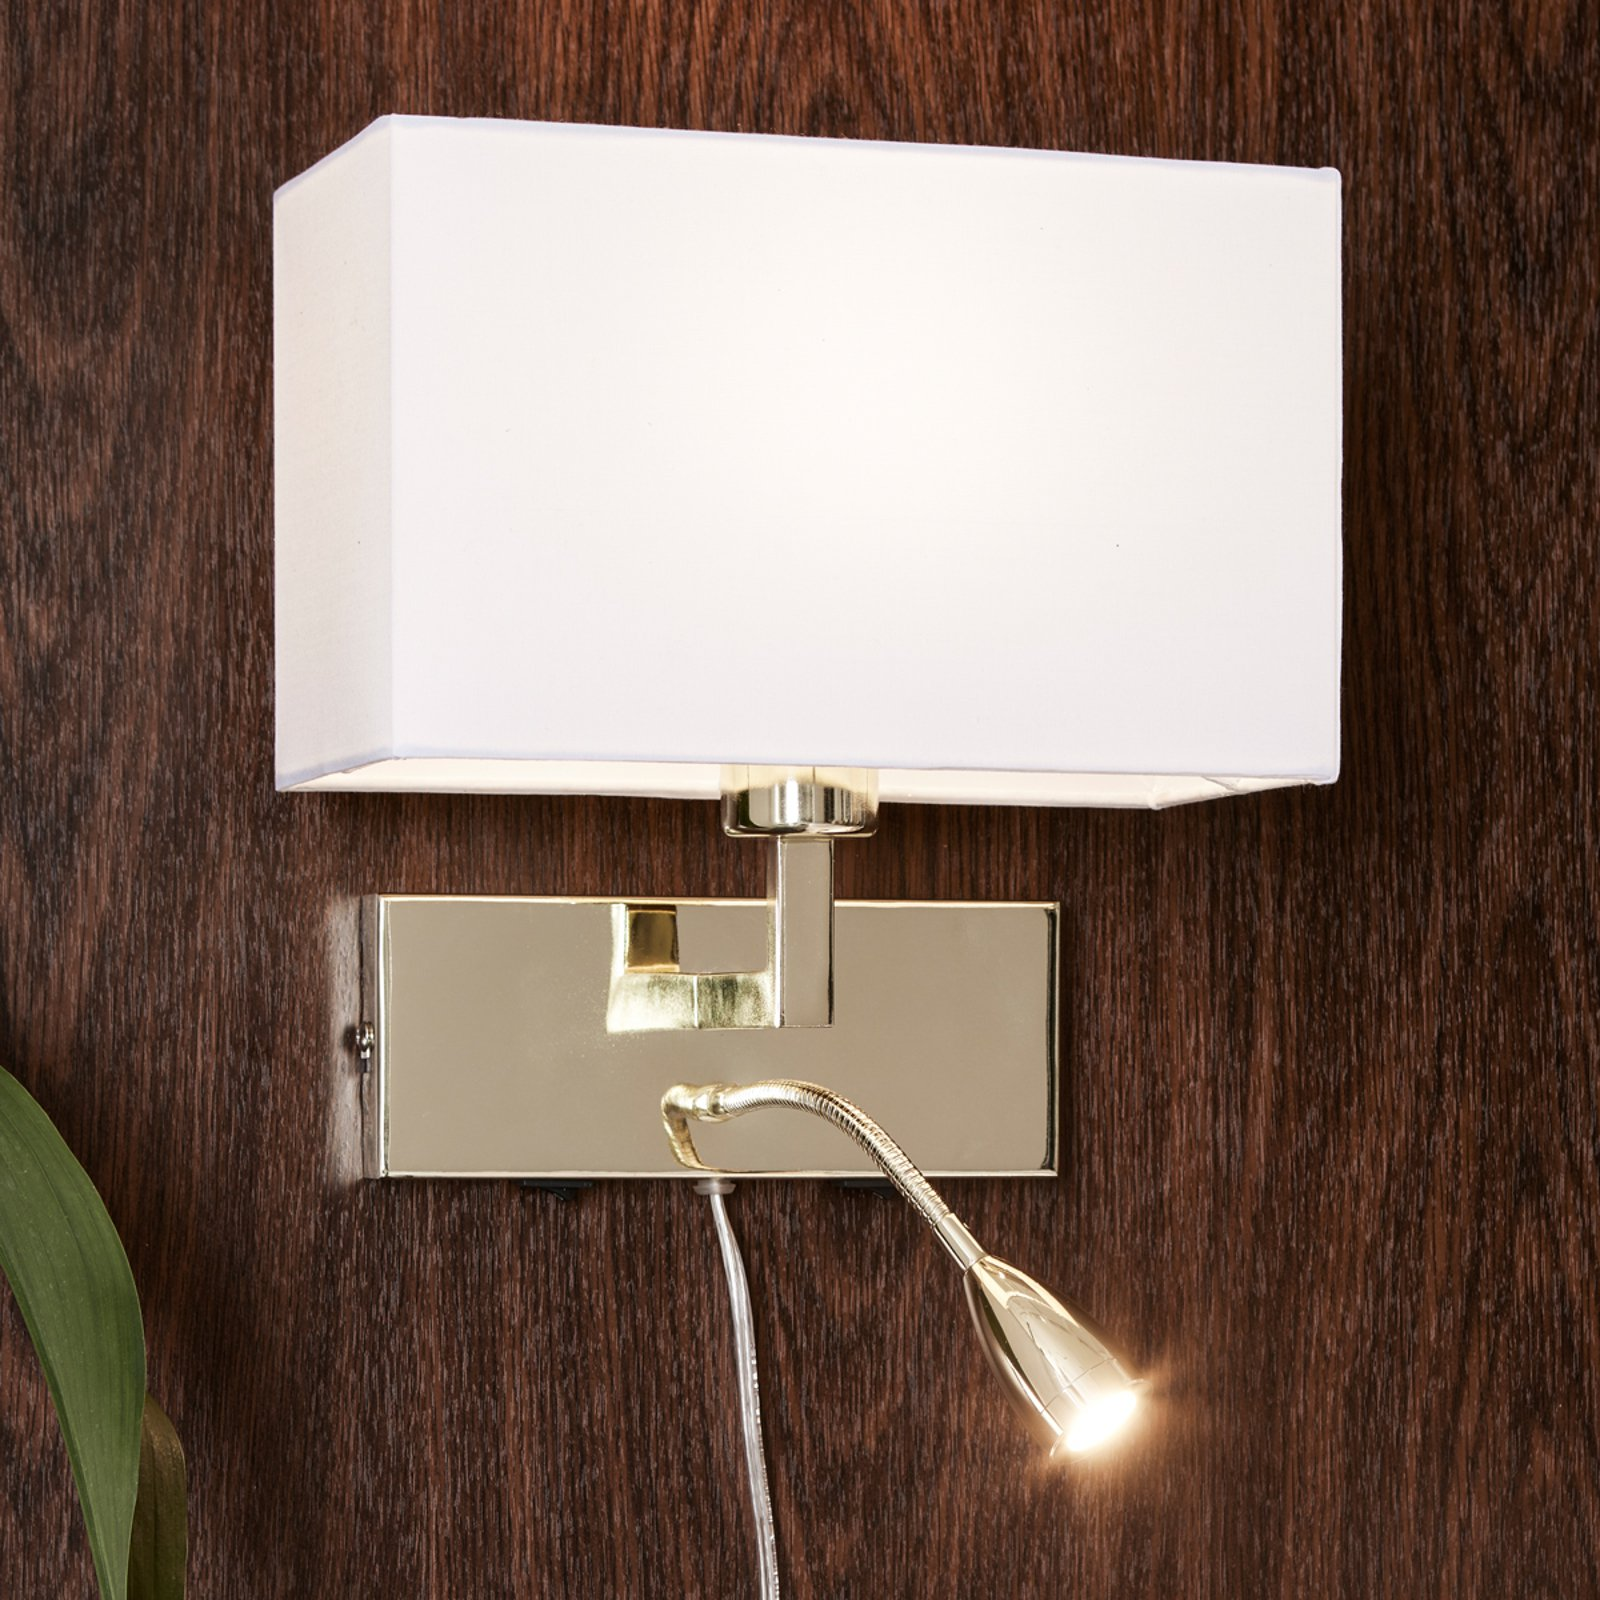 Med LED-leselampe - vegglampe Savoy